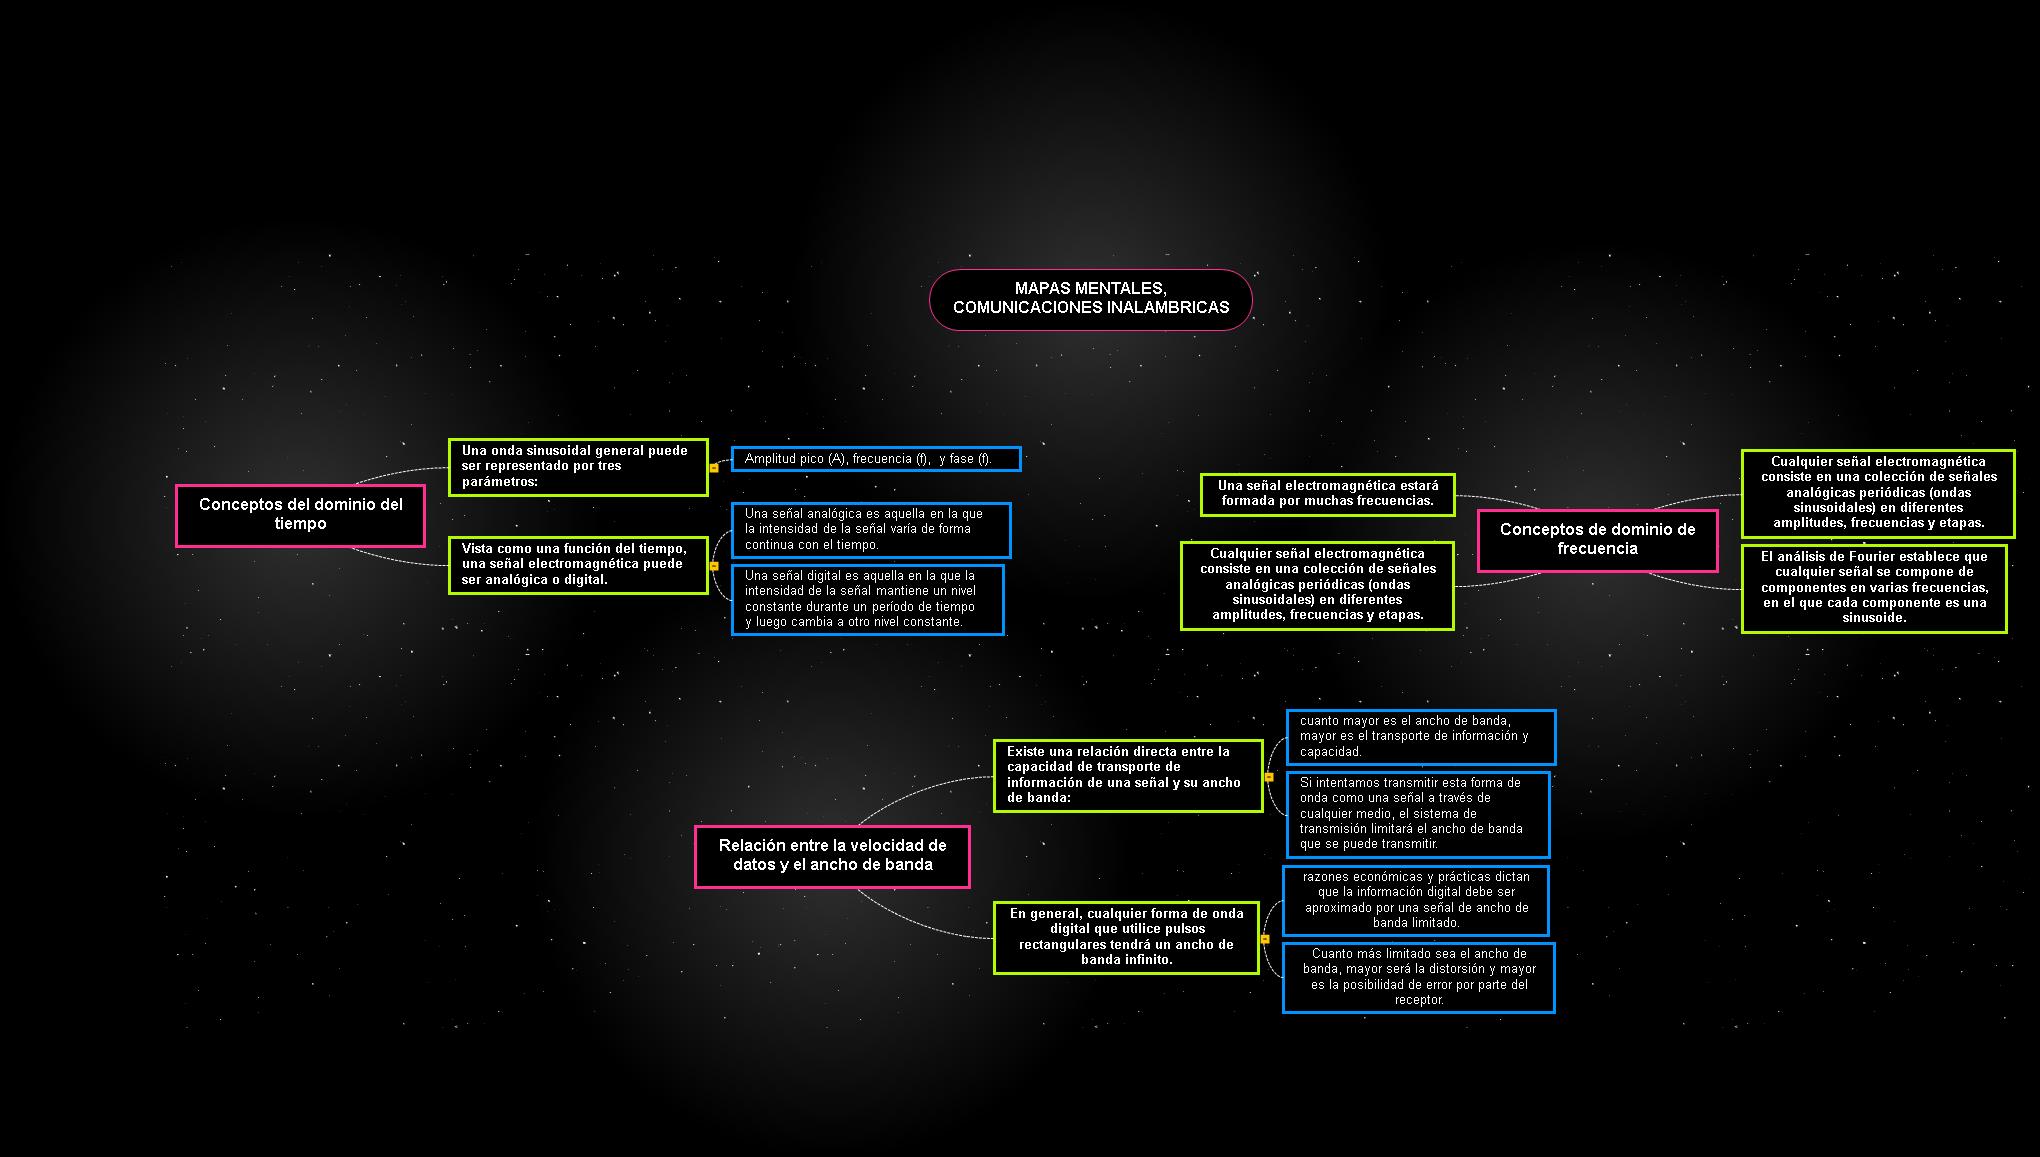 Comunicaciones Inalambricas Mind Map